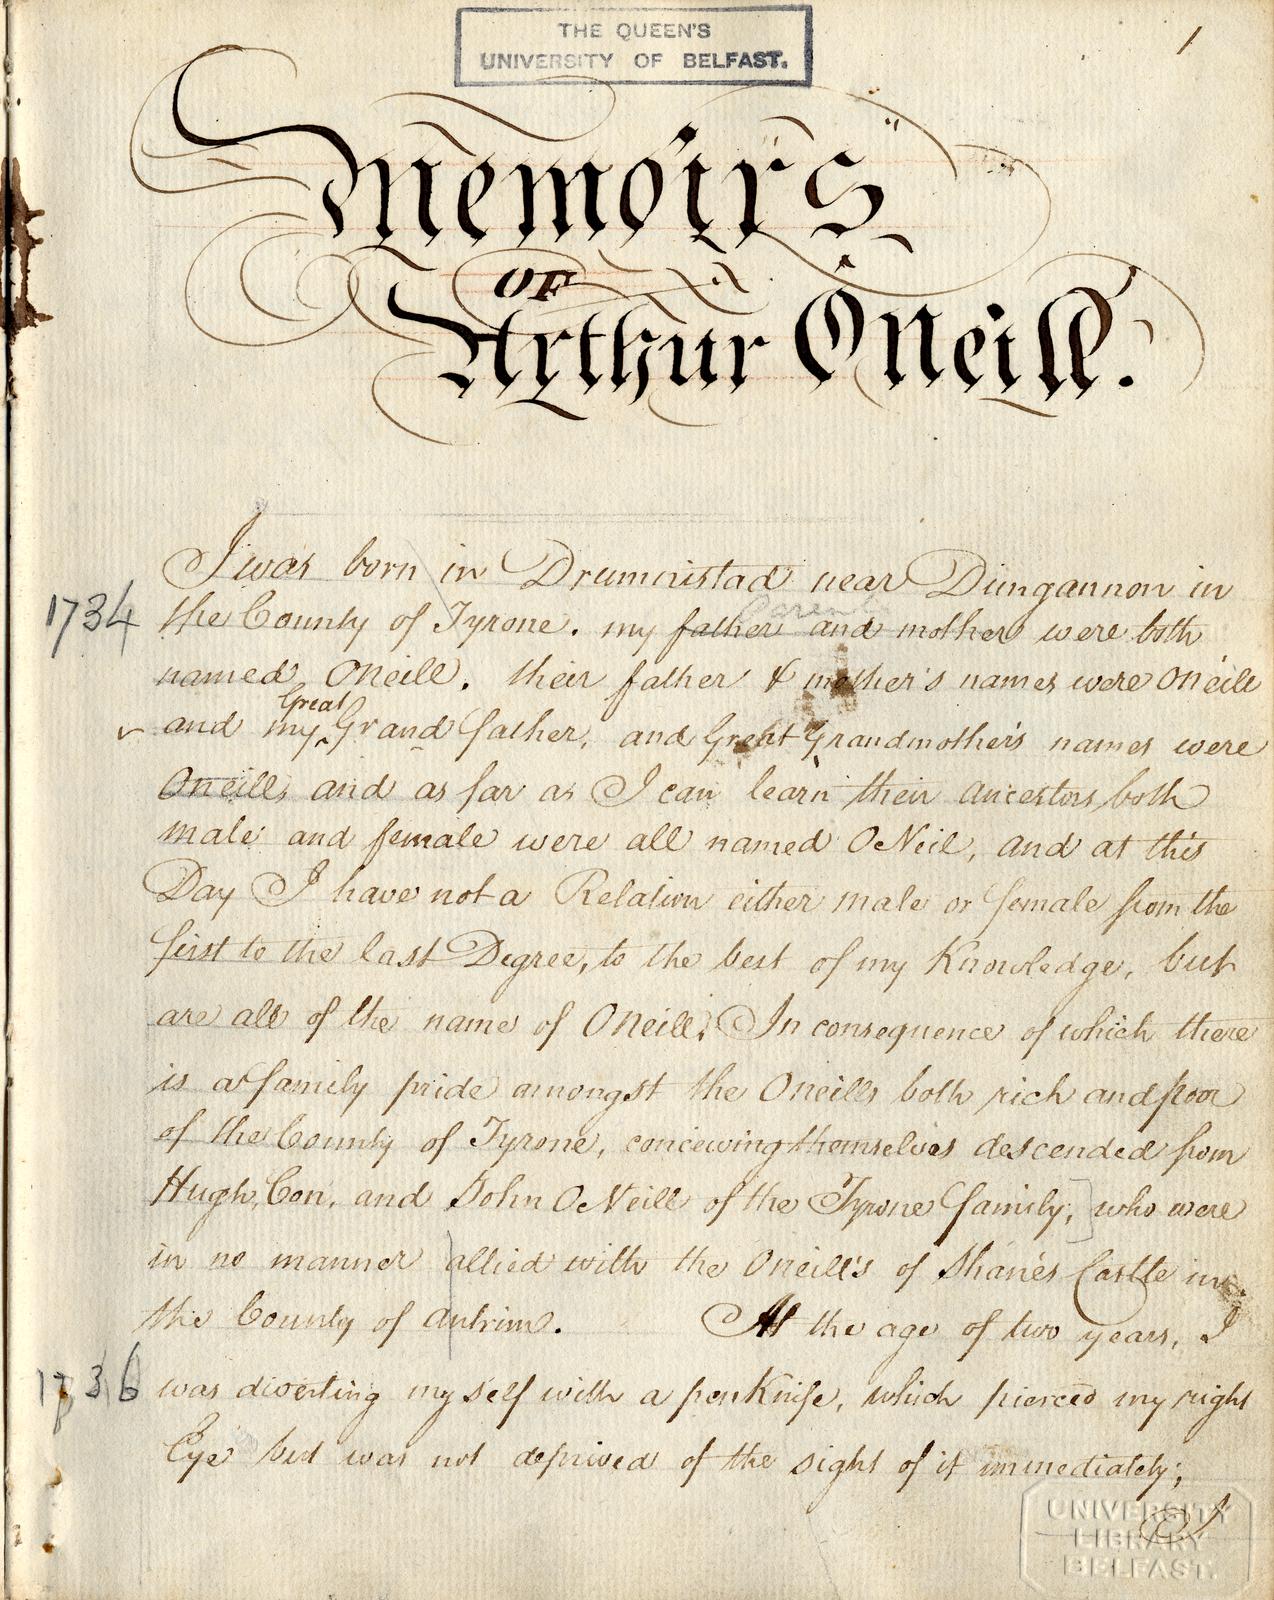 MS 4/14/1, Memoirs of Arthur O'Neill